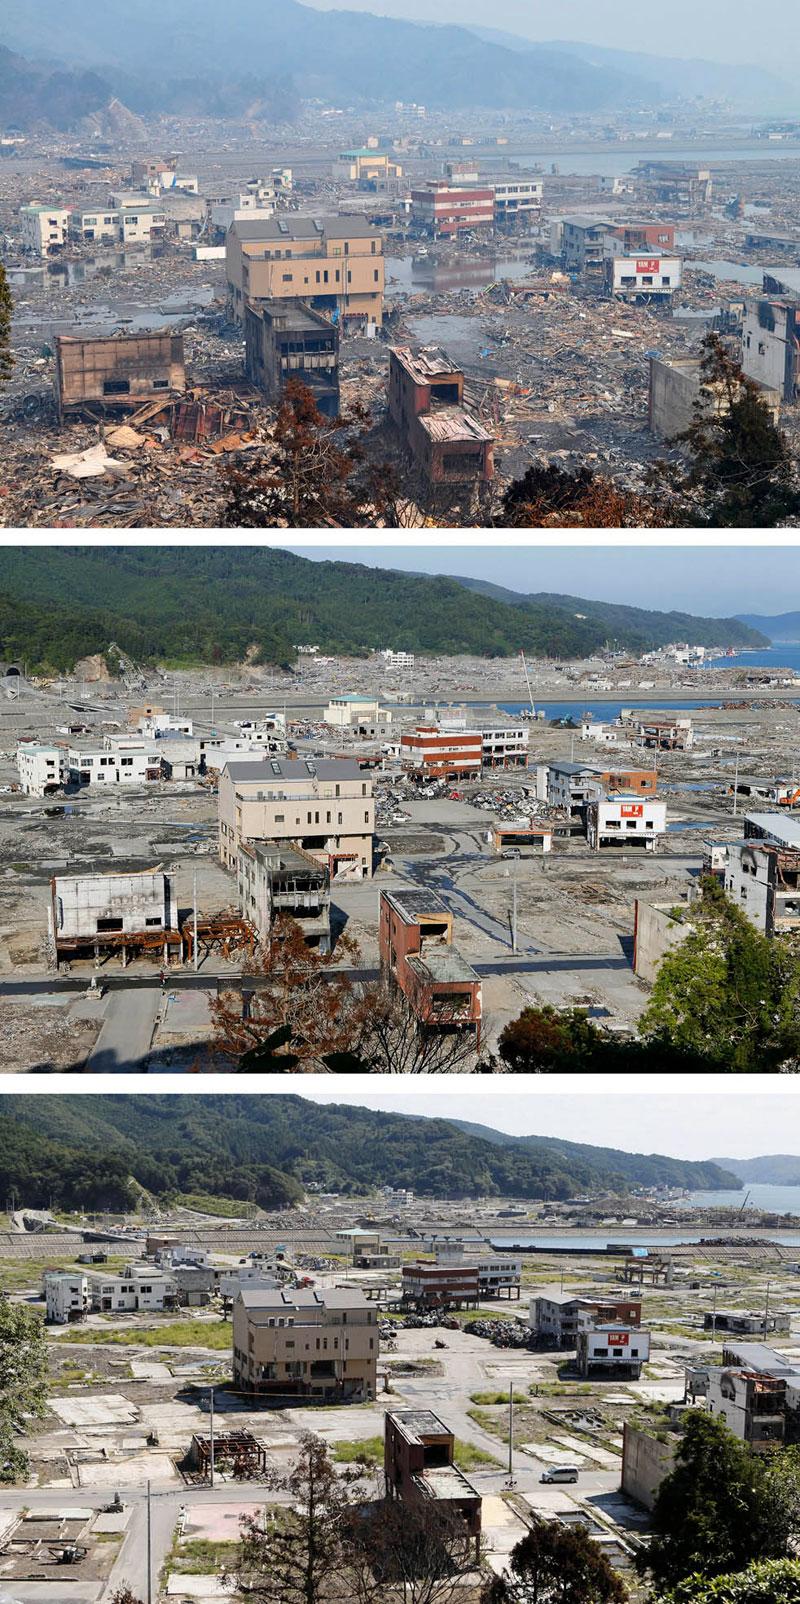 http://www.coucoucircus.org/divers/japon/japon-seisme-08.jpg